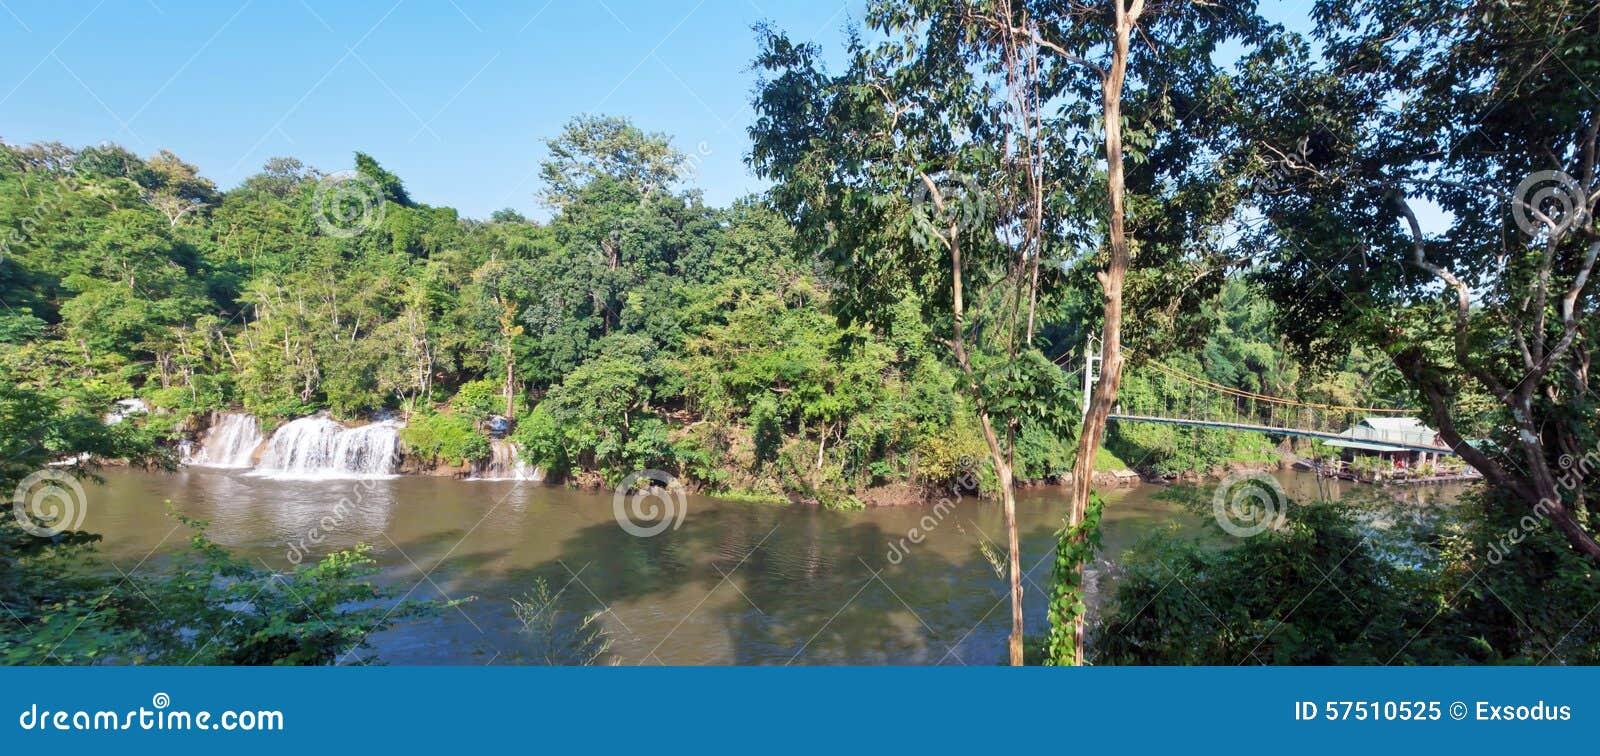 Sai Yok Yai Waterfall With Suspension Bridge Stock Photo ...